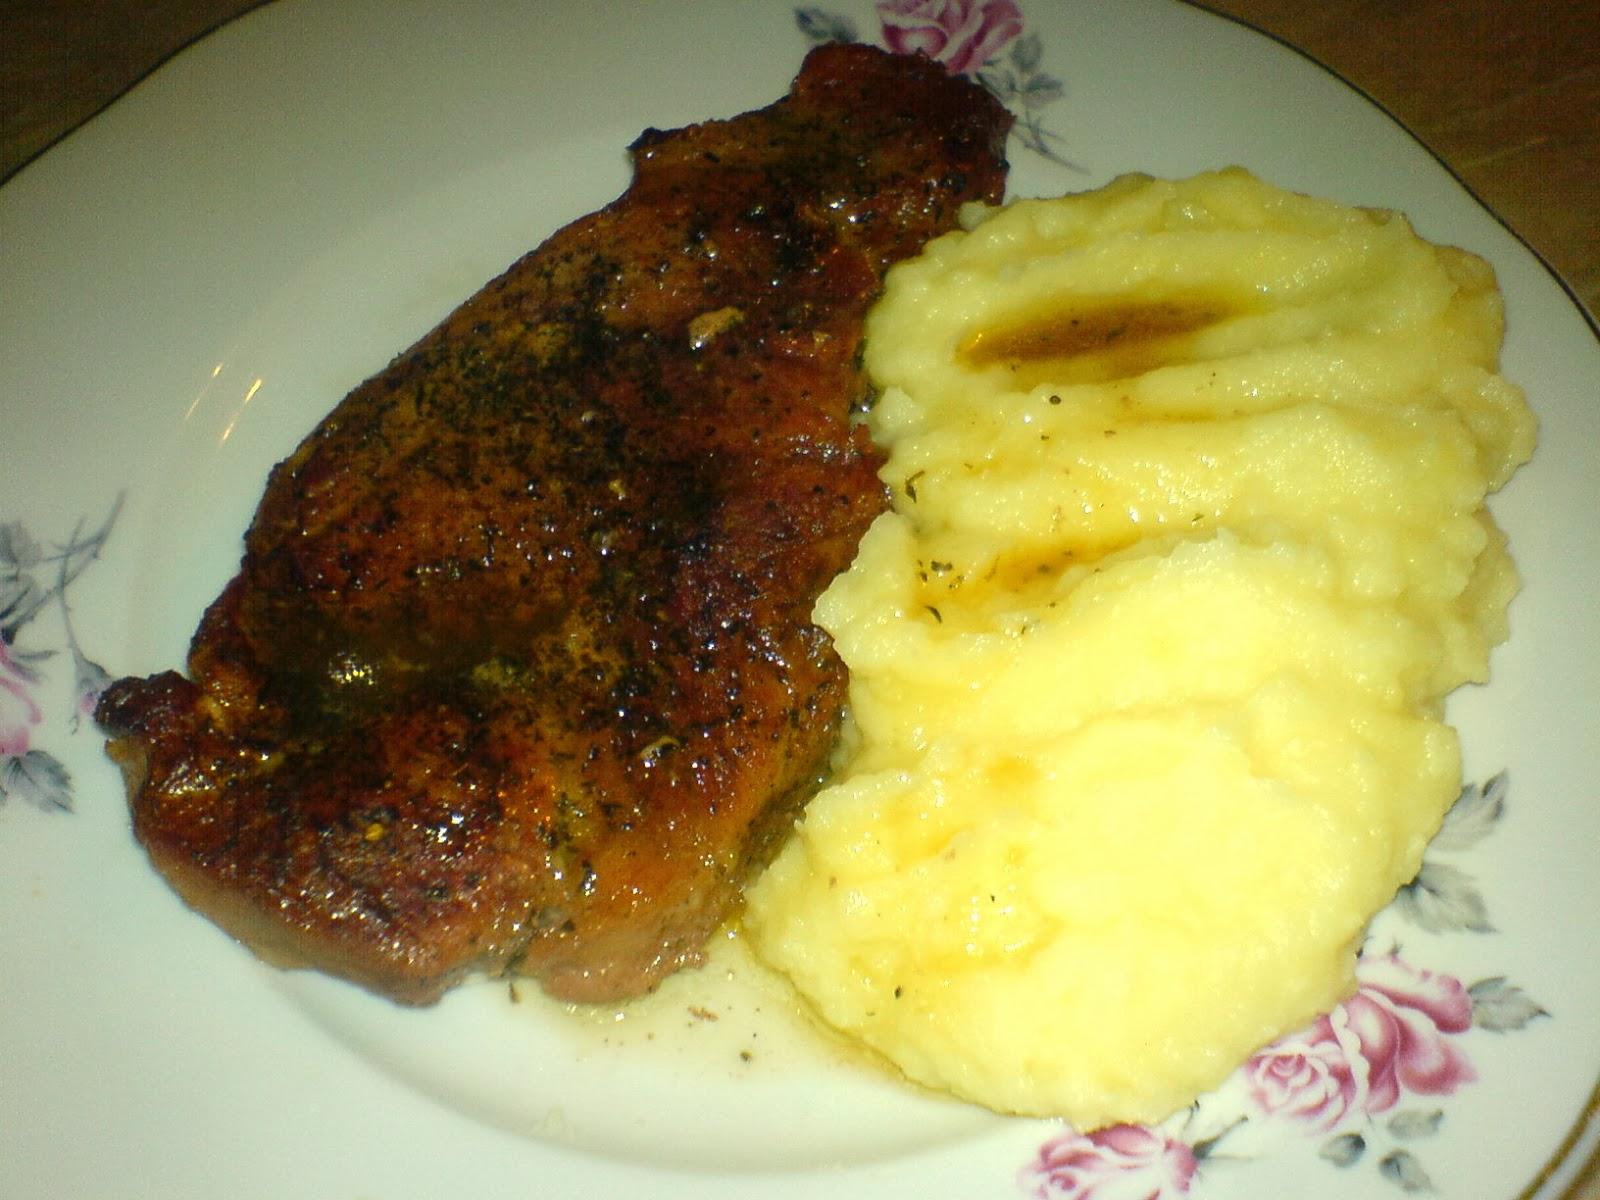 retete culinare, preparate culinare, friptura de porc, retete de mancare, friptura cu piure de cartofi, retete cu porc, retete si preparate culinare cu carne de porc, friptura la cuptor, retete cu cartofi,